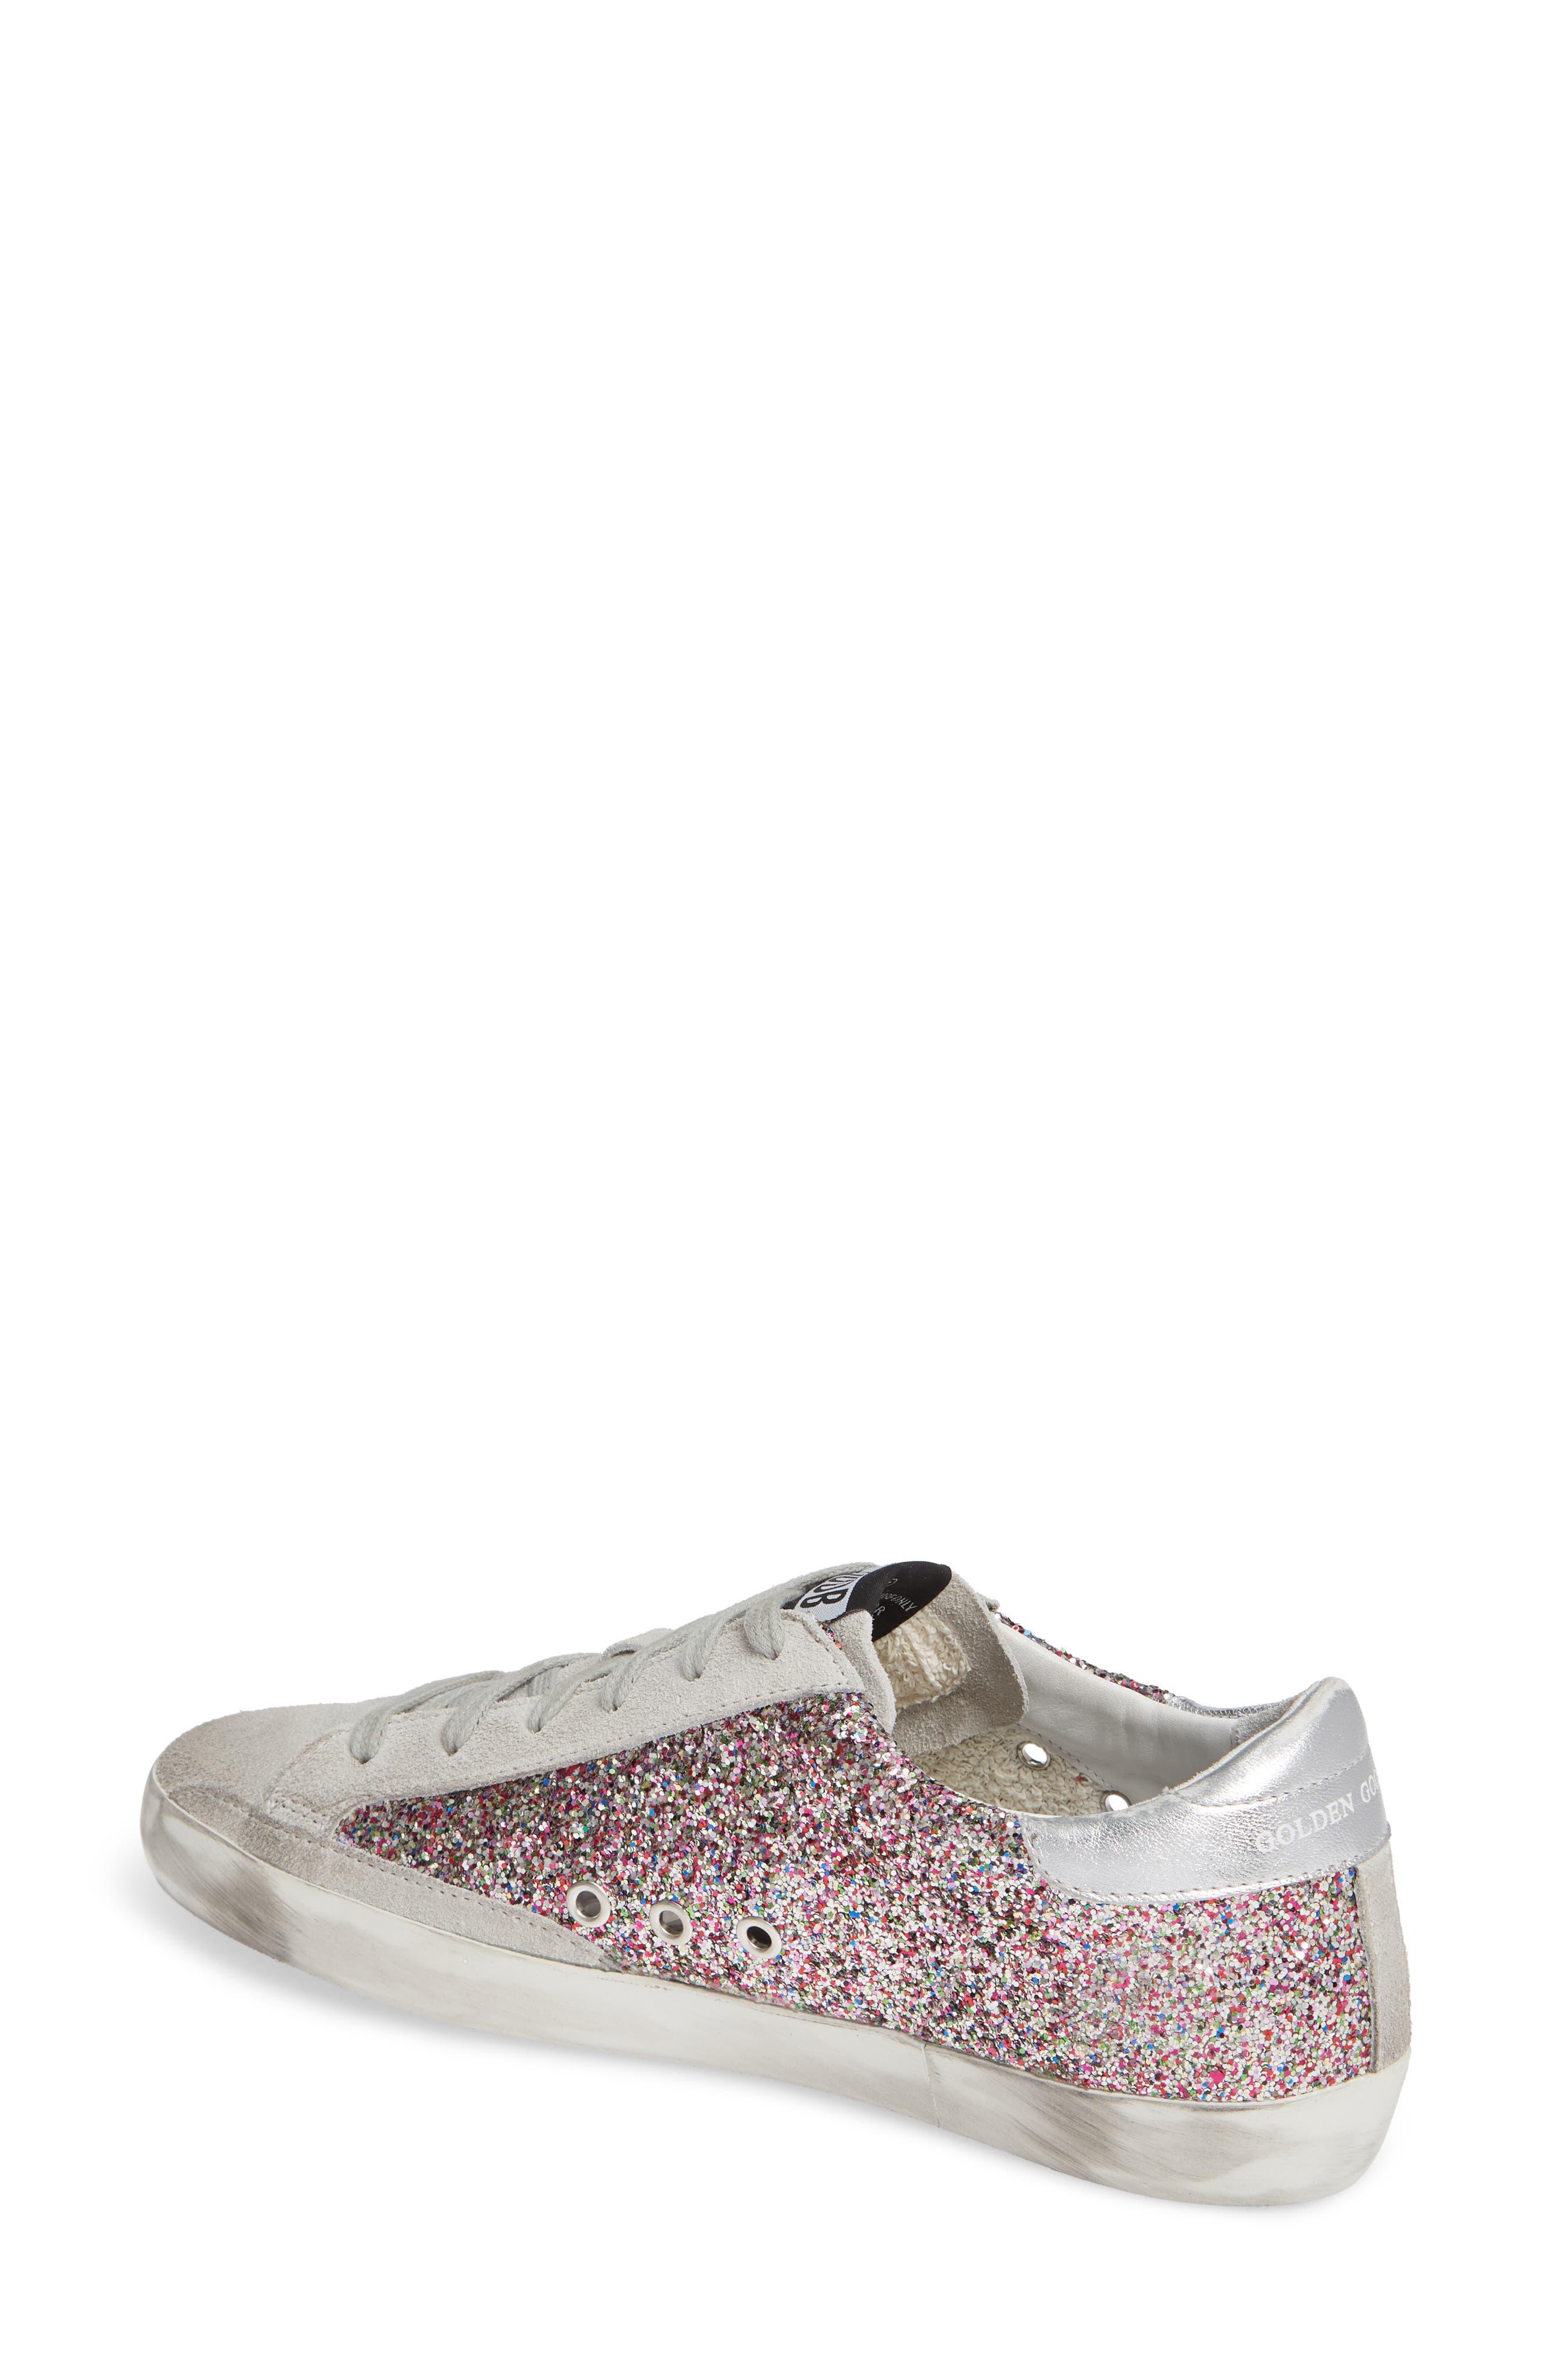 Superstar Glitter Sneaker,                             Alternate thumbnail 2, color,                             PINK MULTI/ GREY